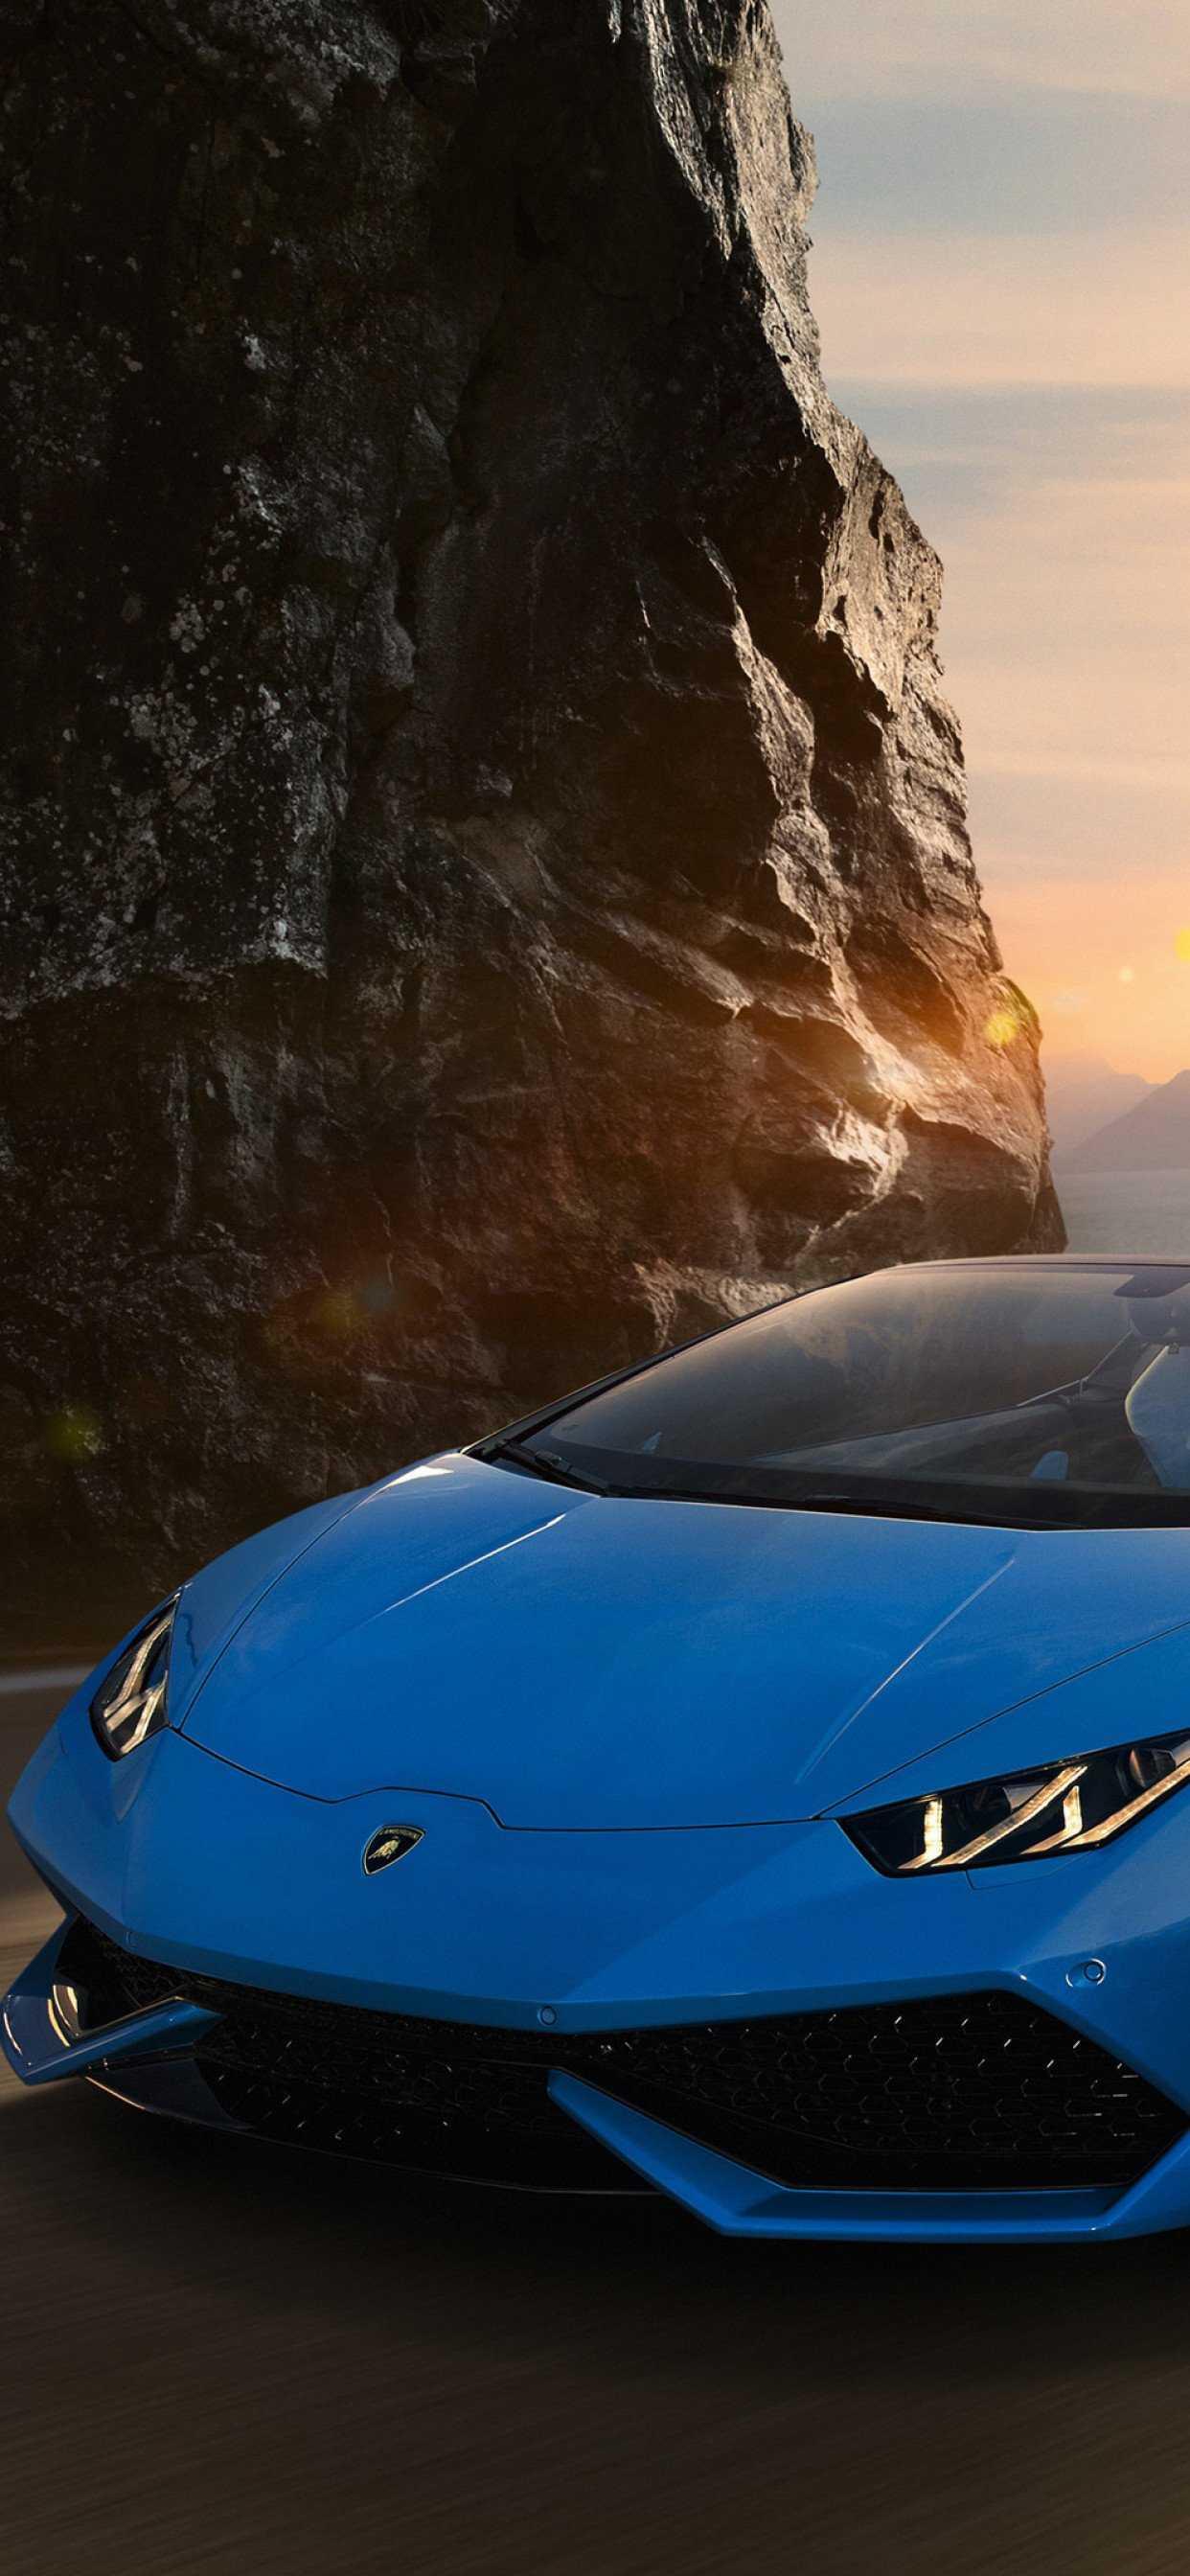 Blue Lamborghini Wallpaper 4k Iphone 3152689 Hd Wallpaper Backgrounds Download